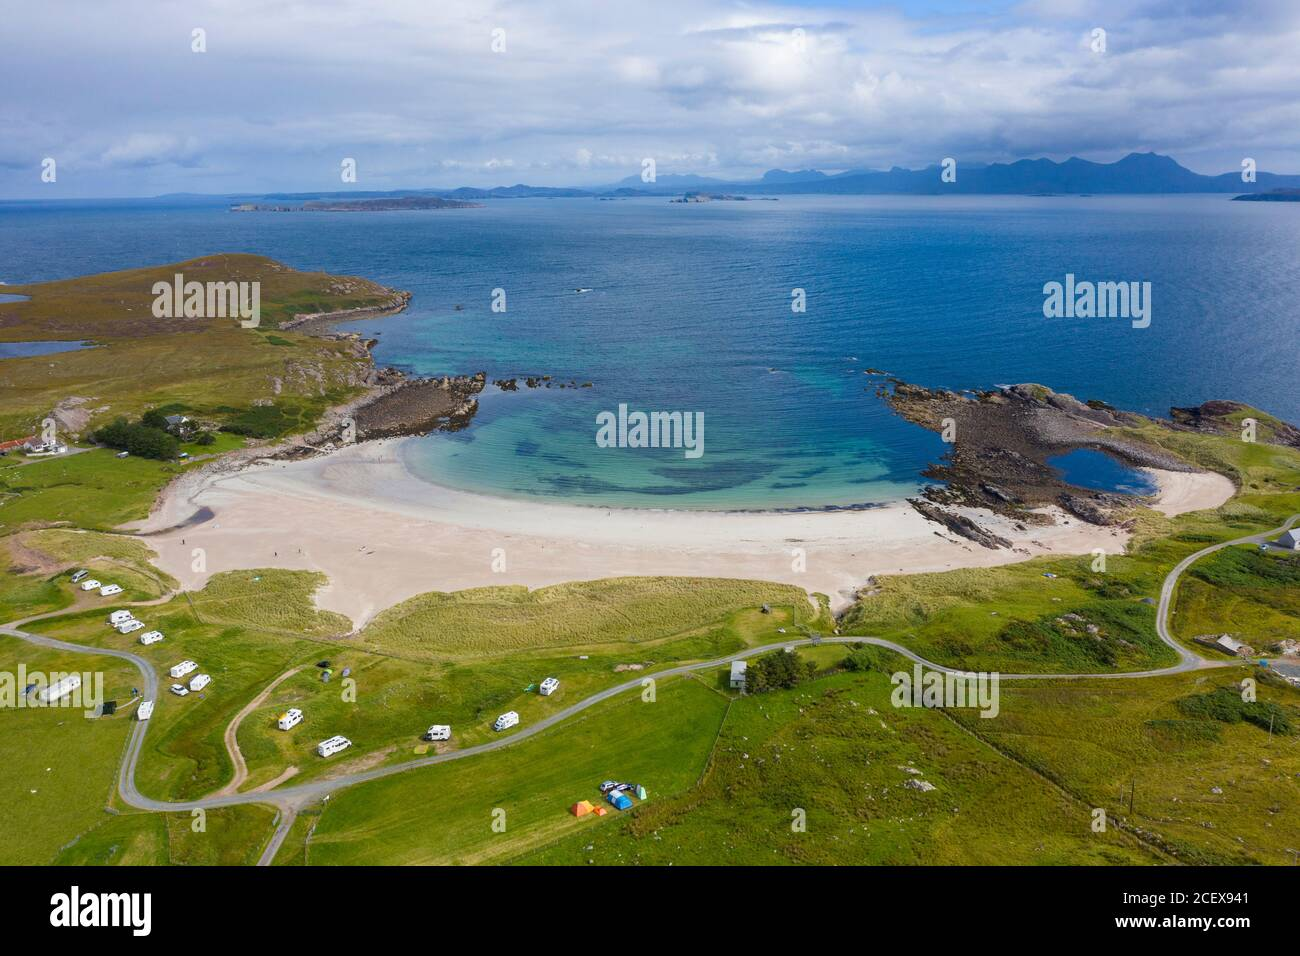 Vista aérea de la playa de Mellon Udrigle en Ross-shire en Scottish Highlands, Reino Unido Foto de stock